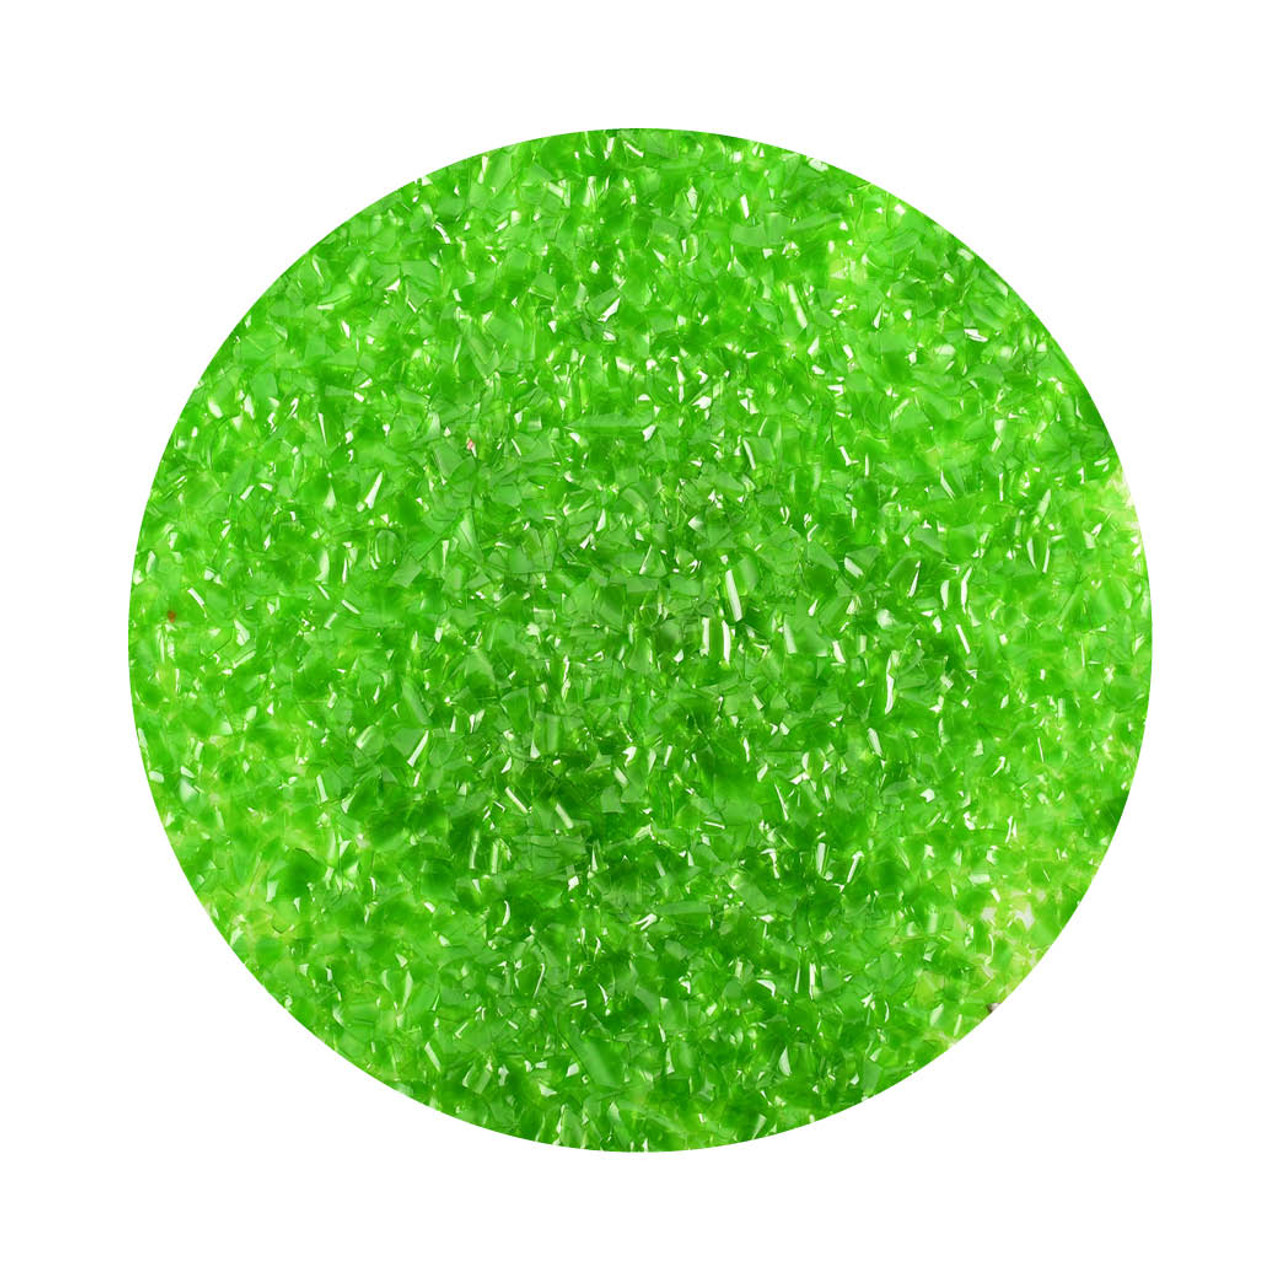 BULK 200g - Edible Crafting Glitter - Green